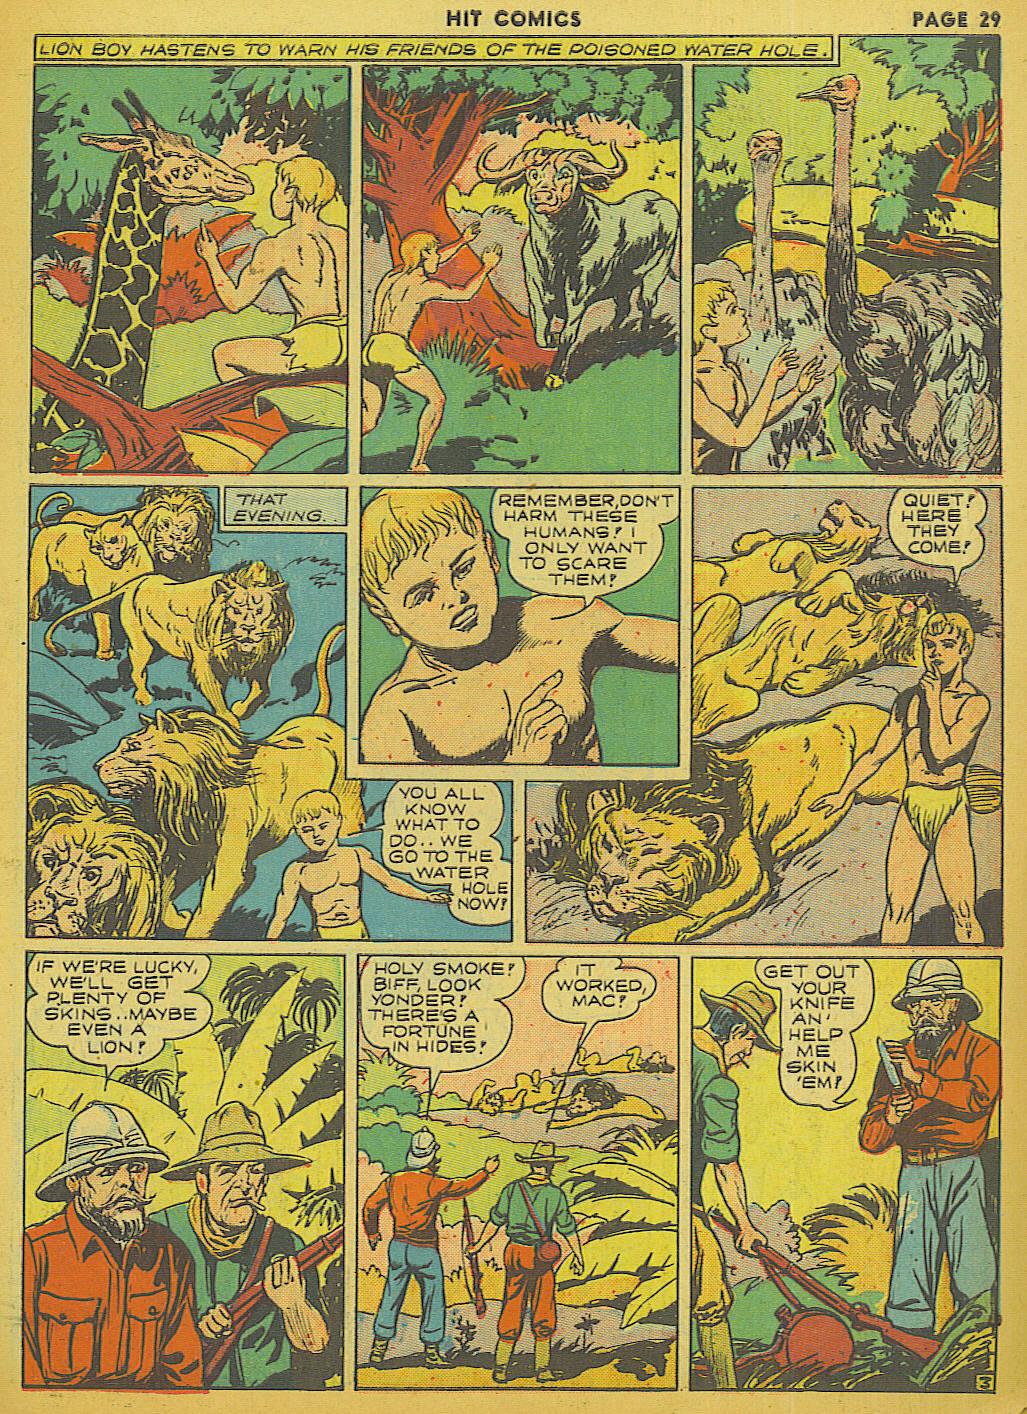 Read online Hit Comics comic -  Issue #13 - 31